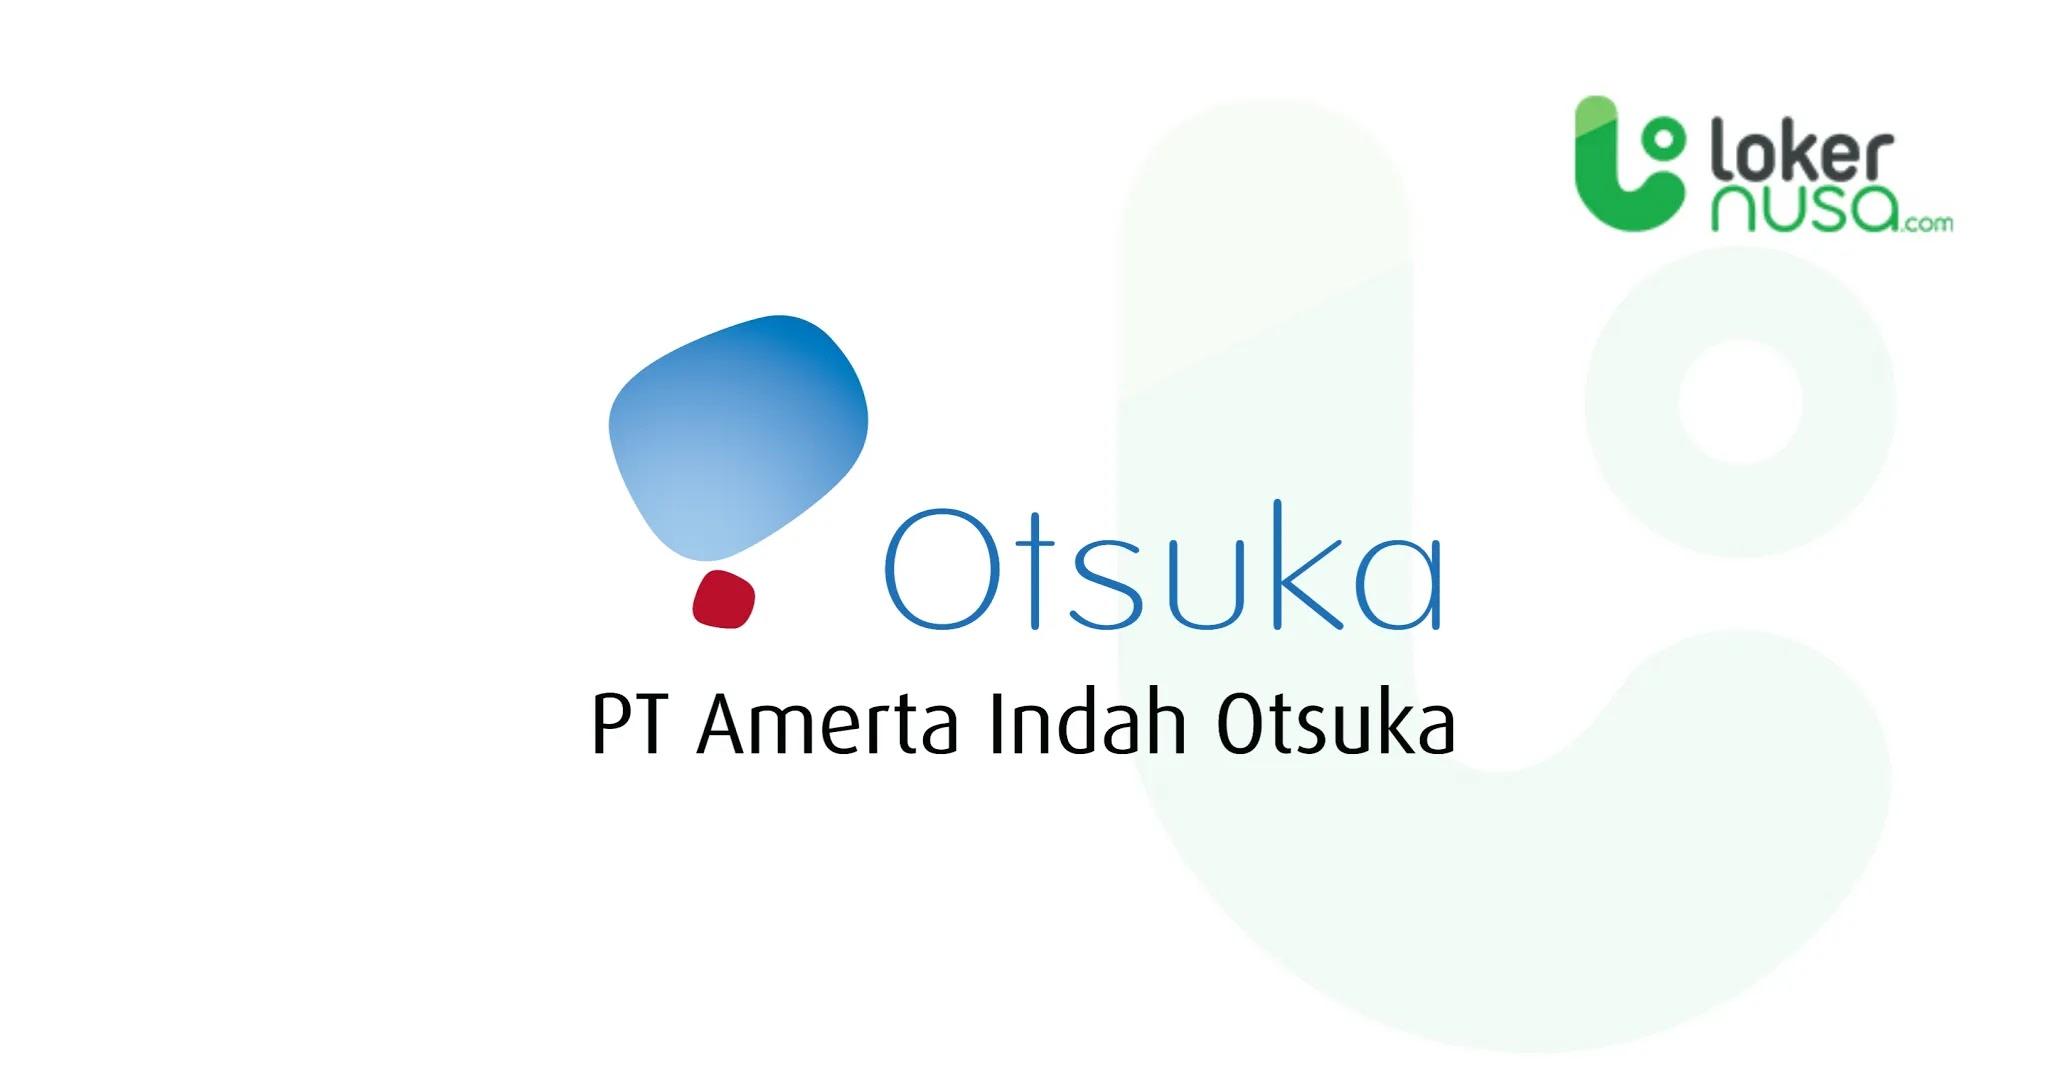 Lowongan Kerja Juli 2021 Amerta Otsuka